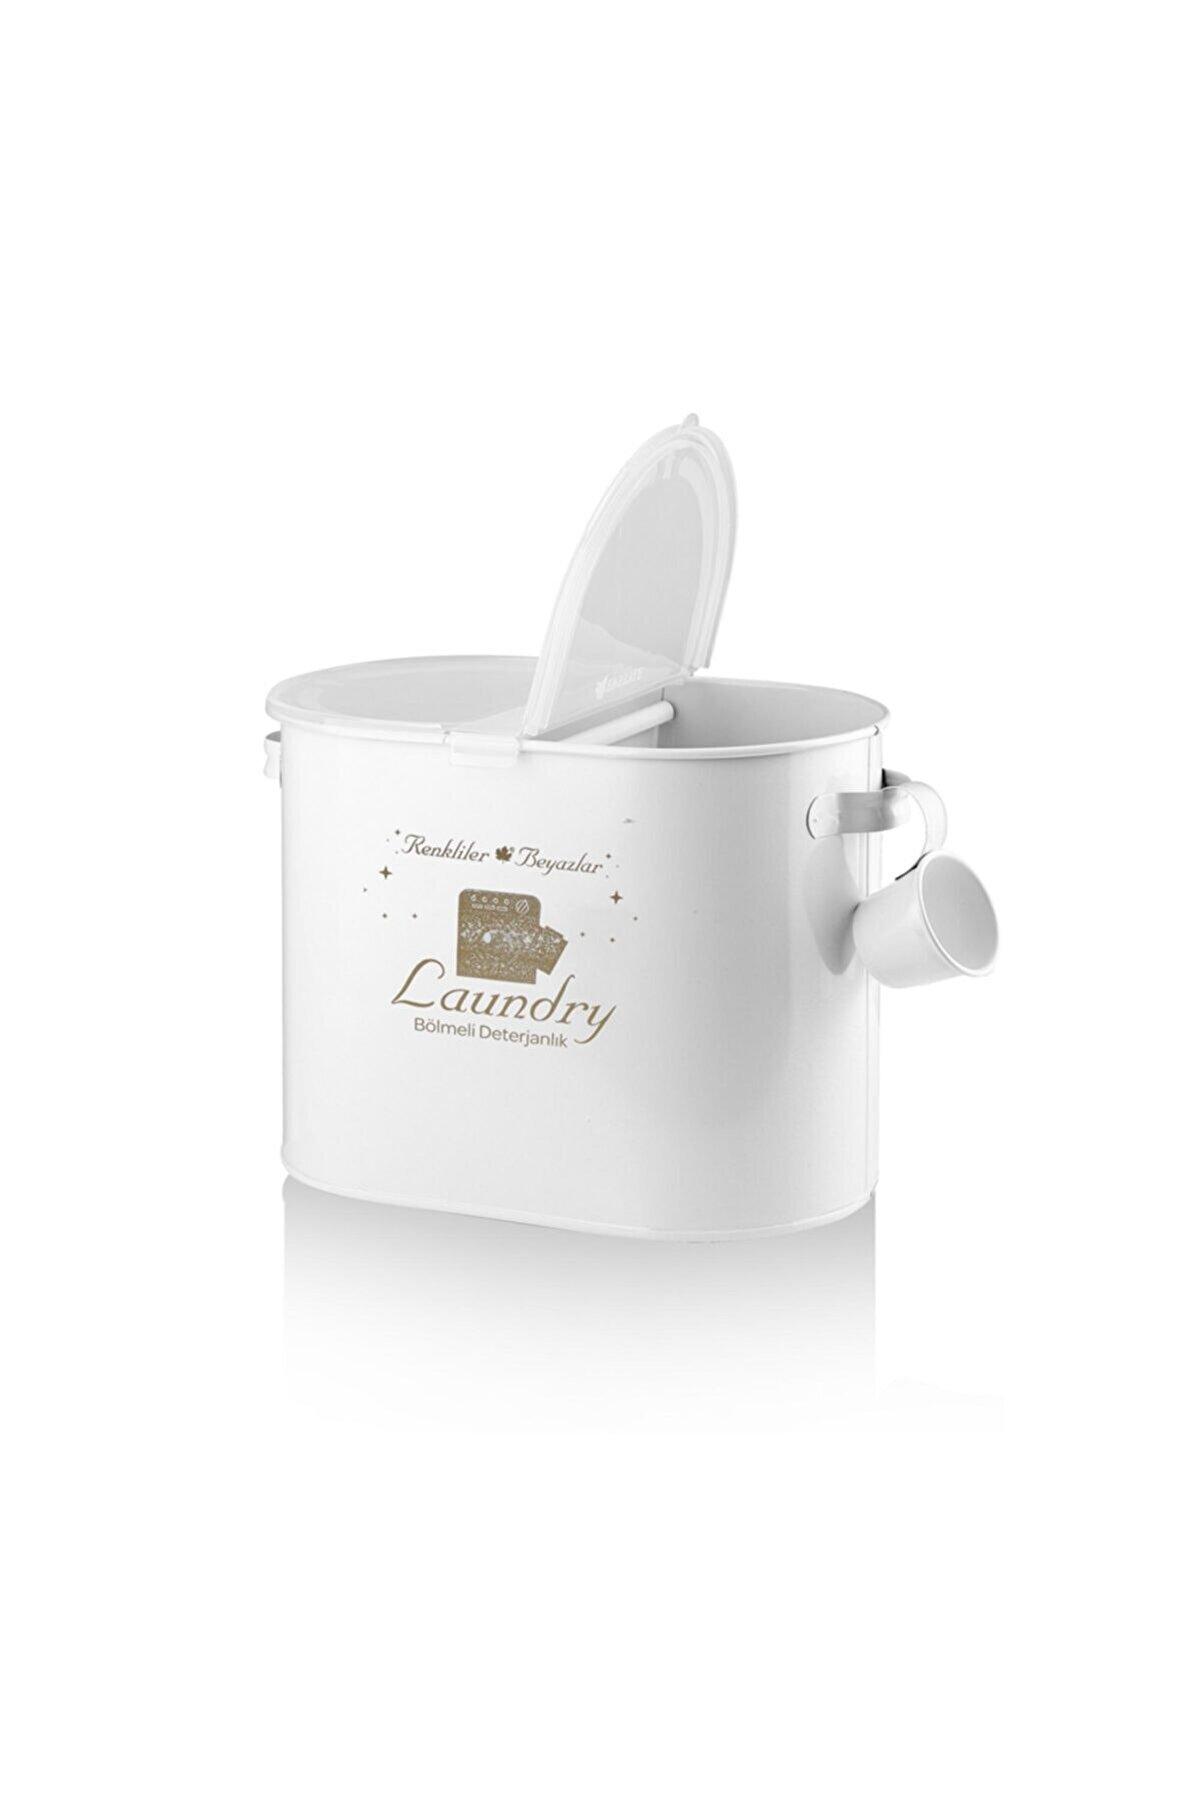 Laundry Metal 2 Bölmeli Deterjan Kutusu Beyaz